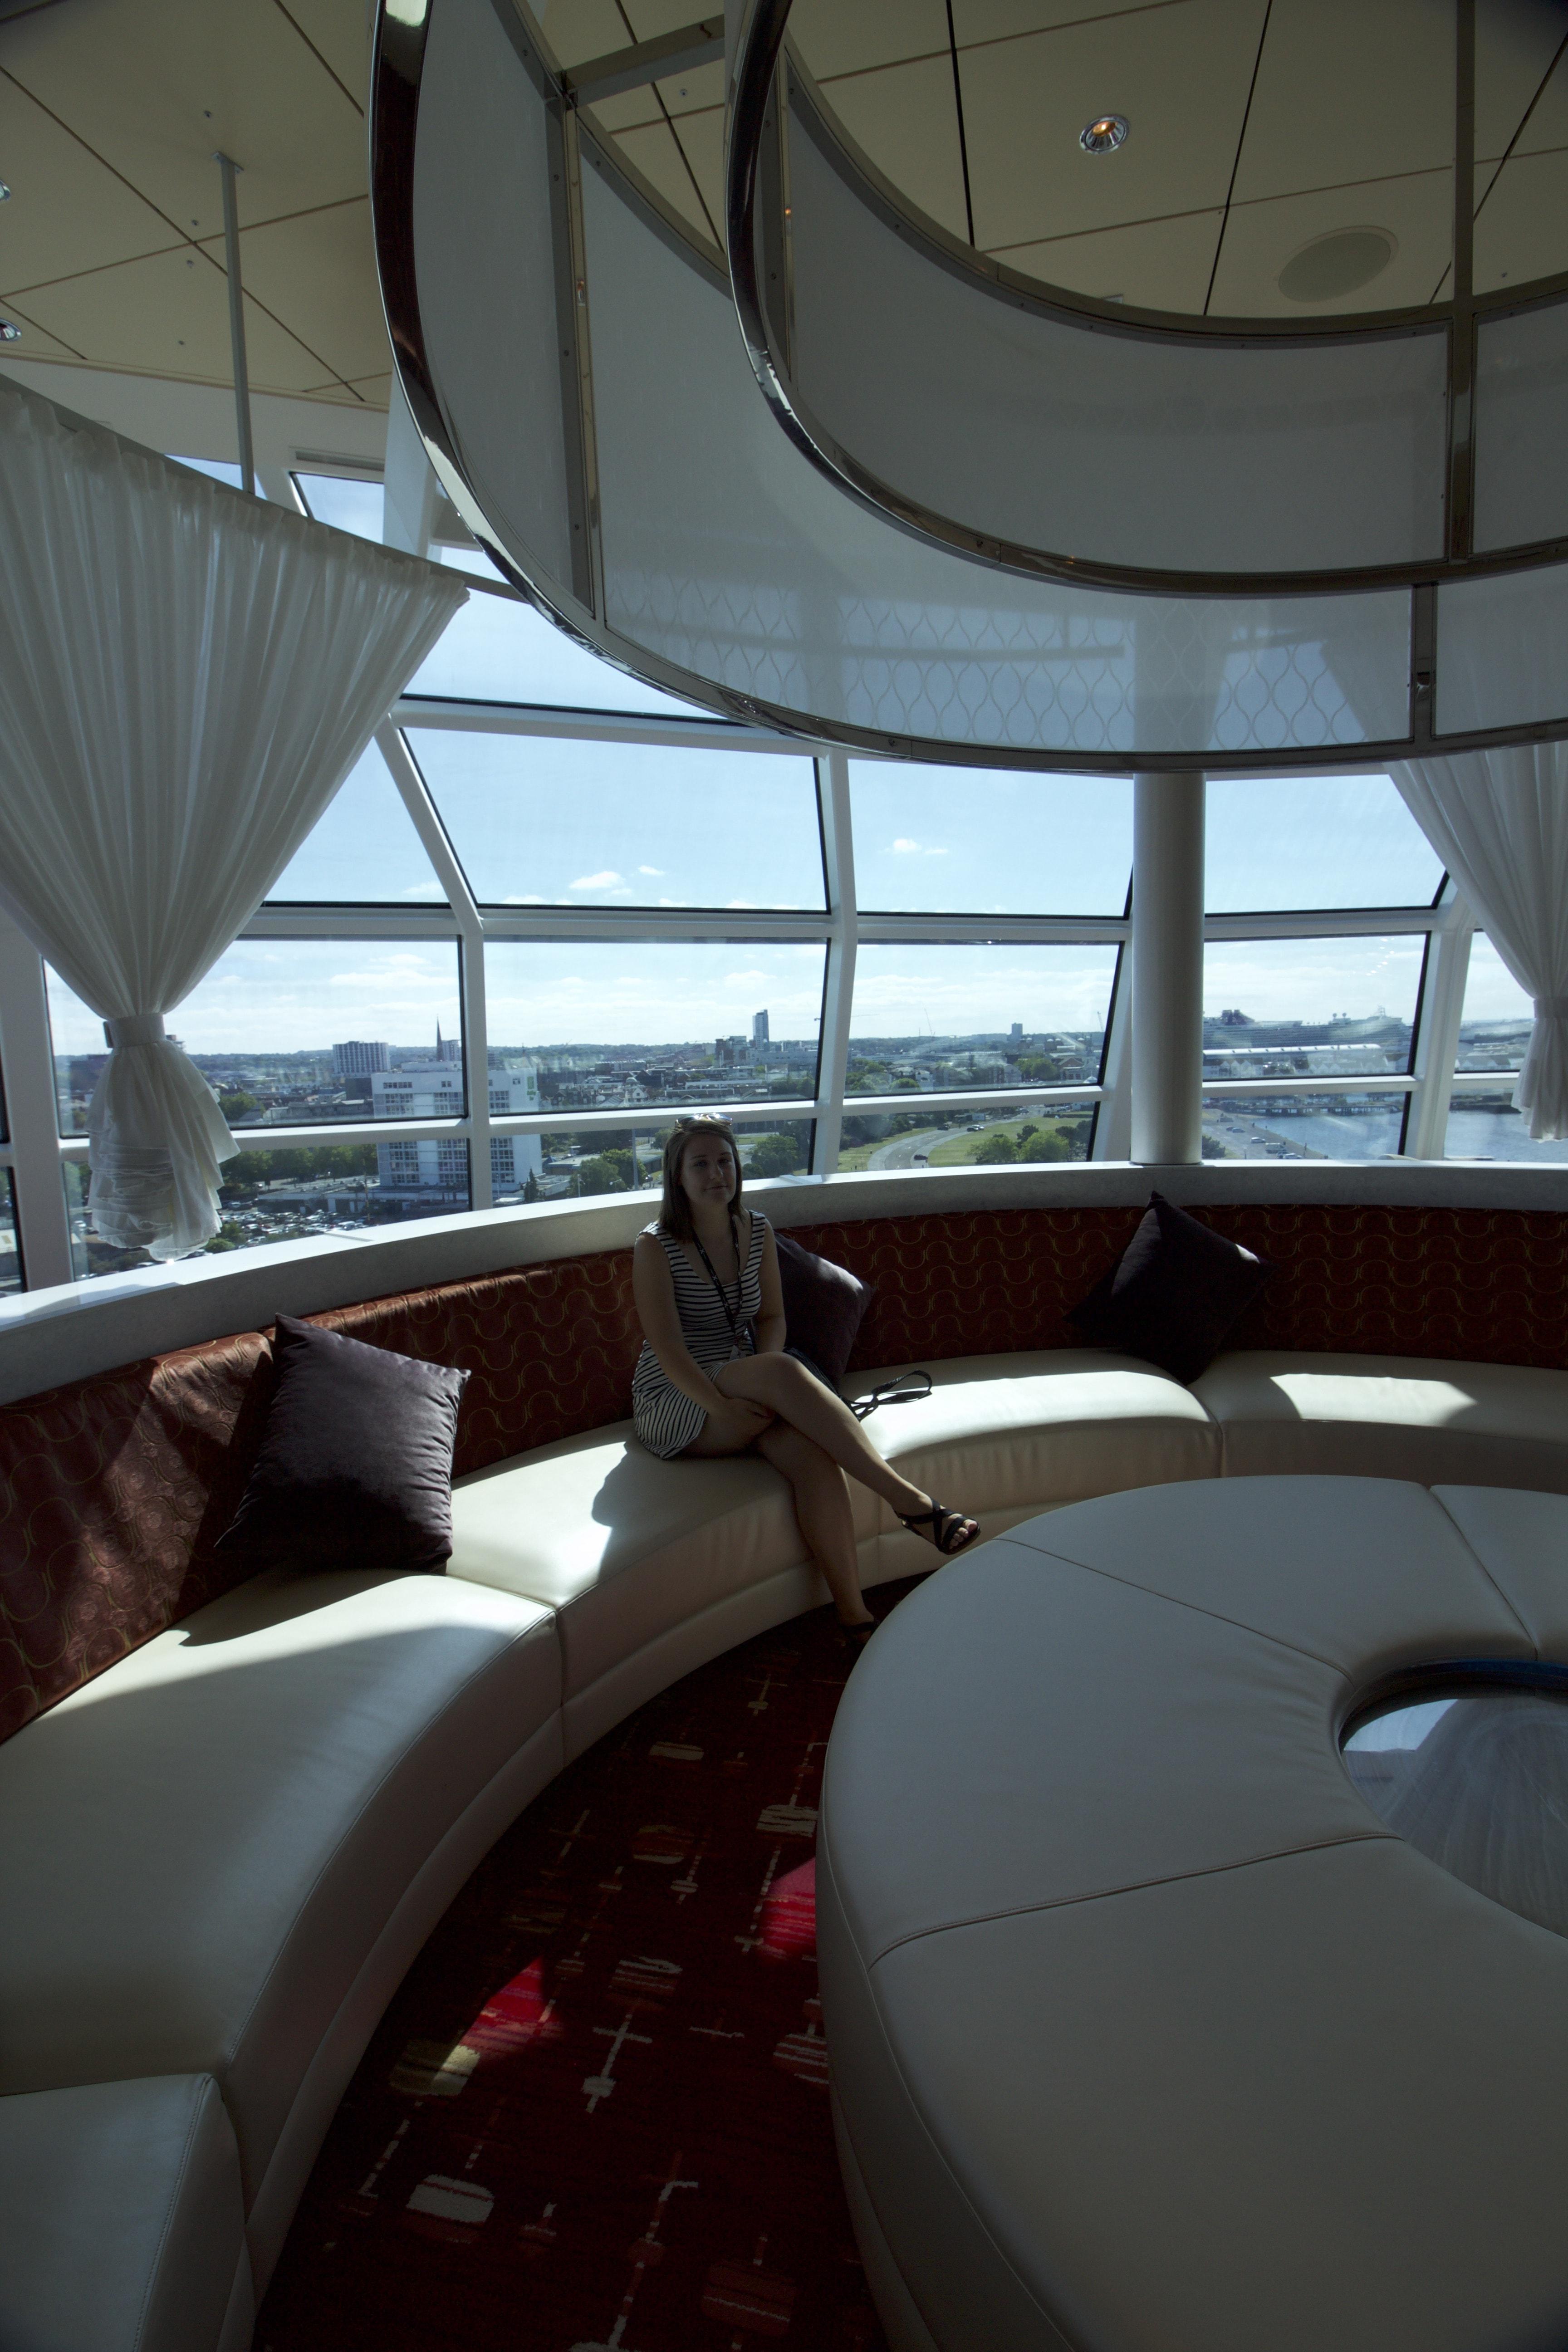 Celebrity Eclipse - Sky lounge girl sofa passenger cruiser young cruise ship